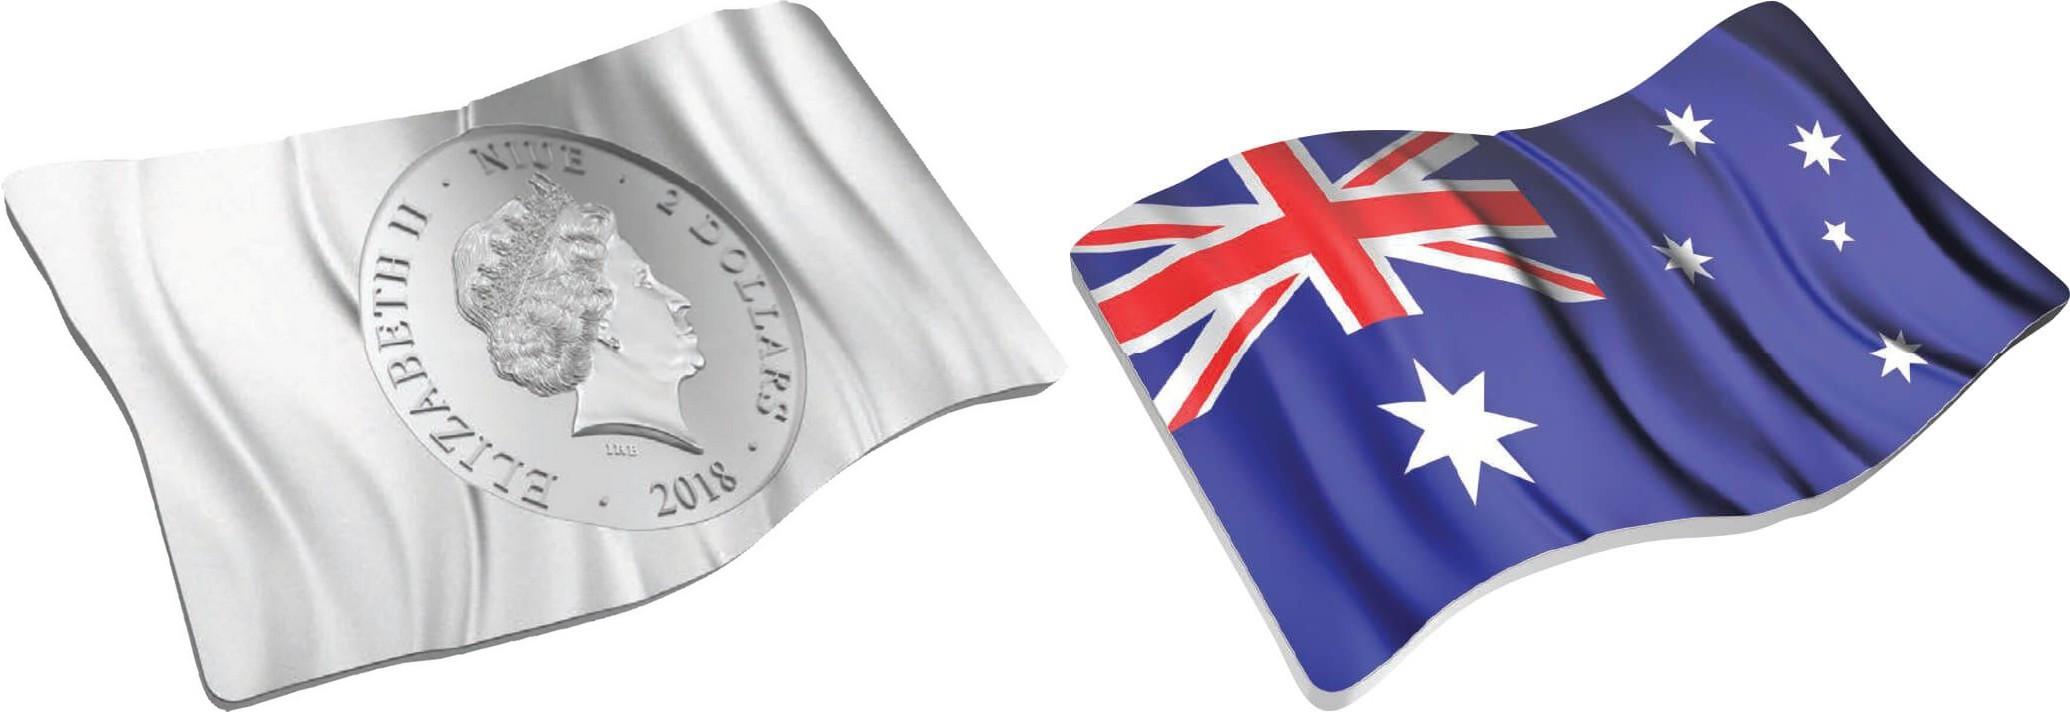 niue 2018 drapeau australien